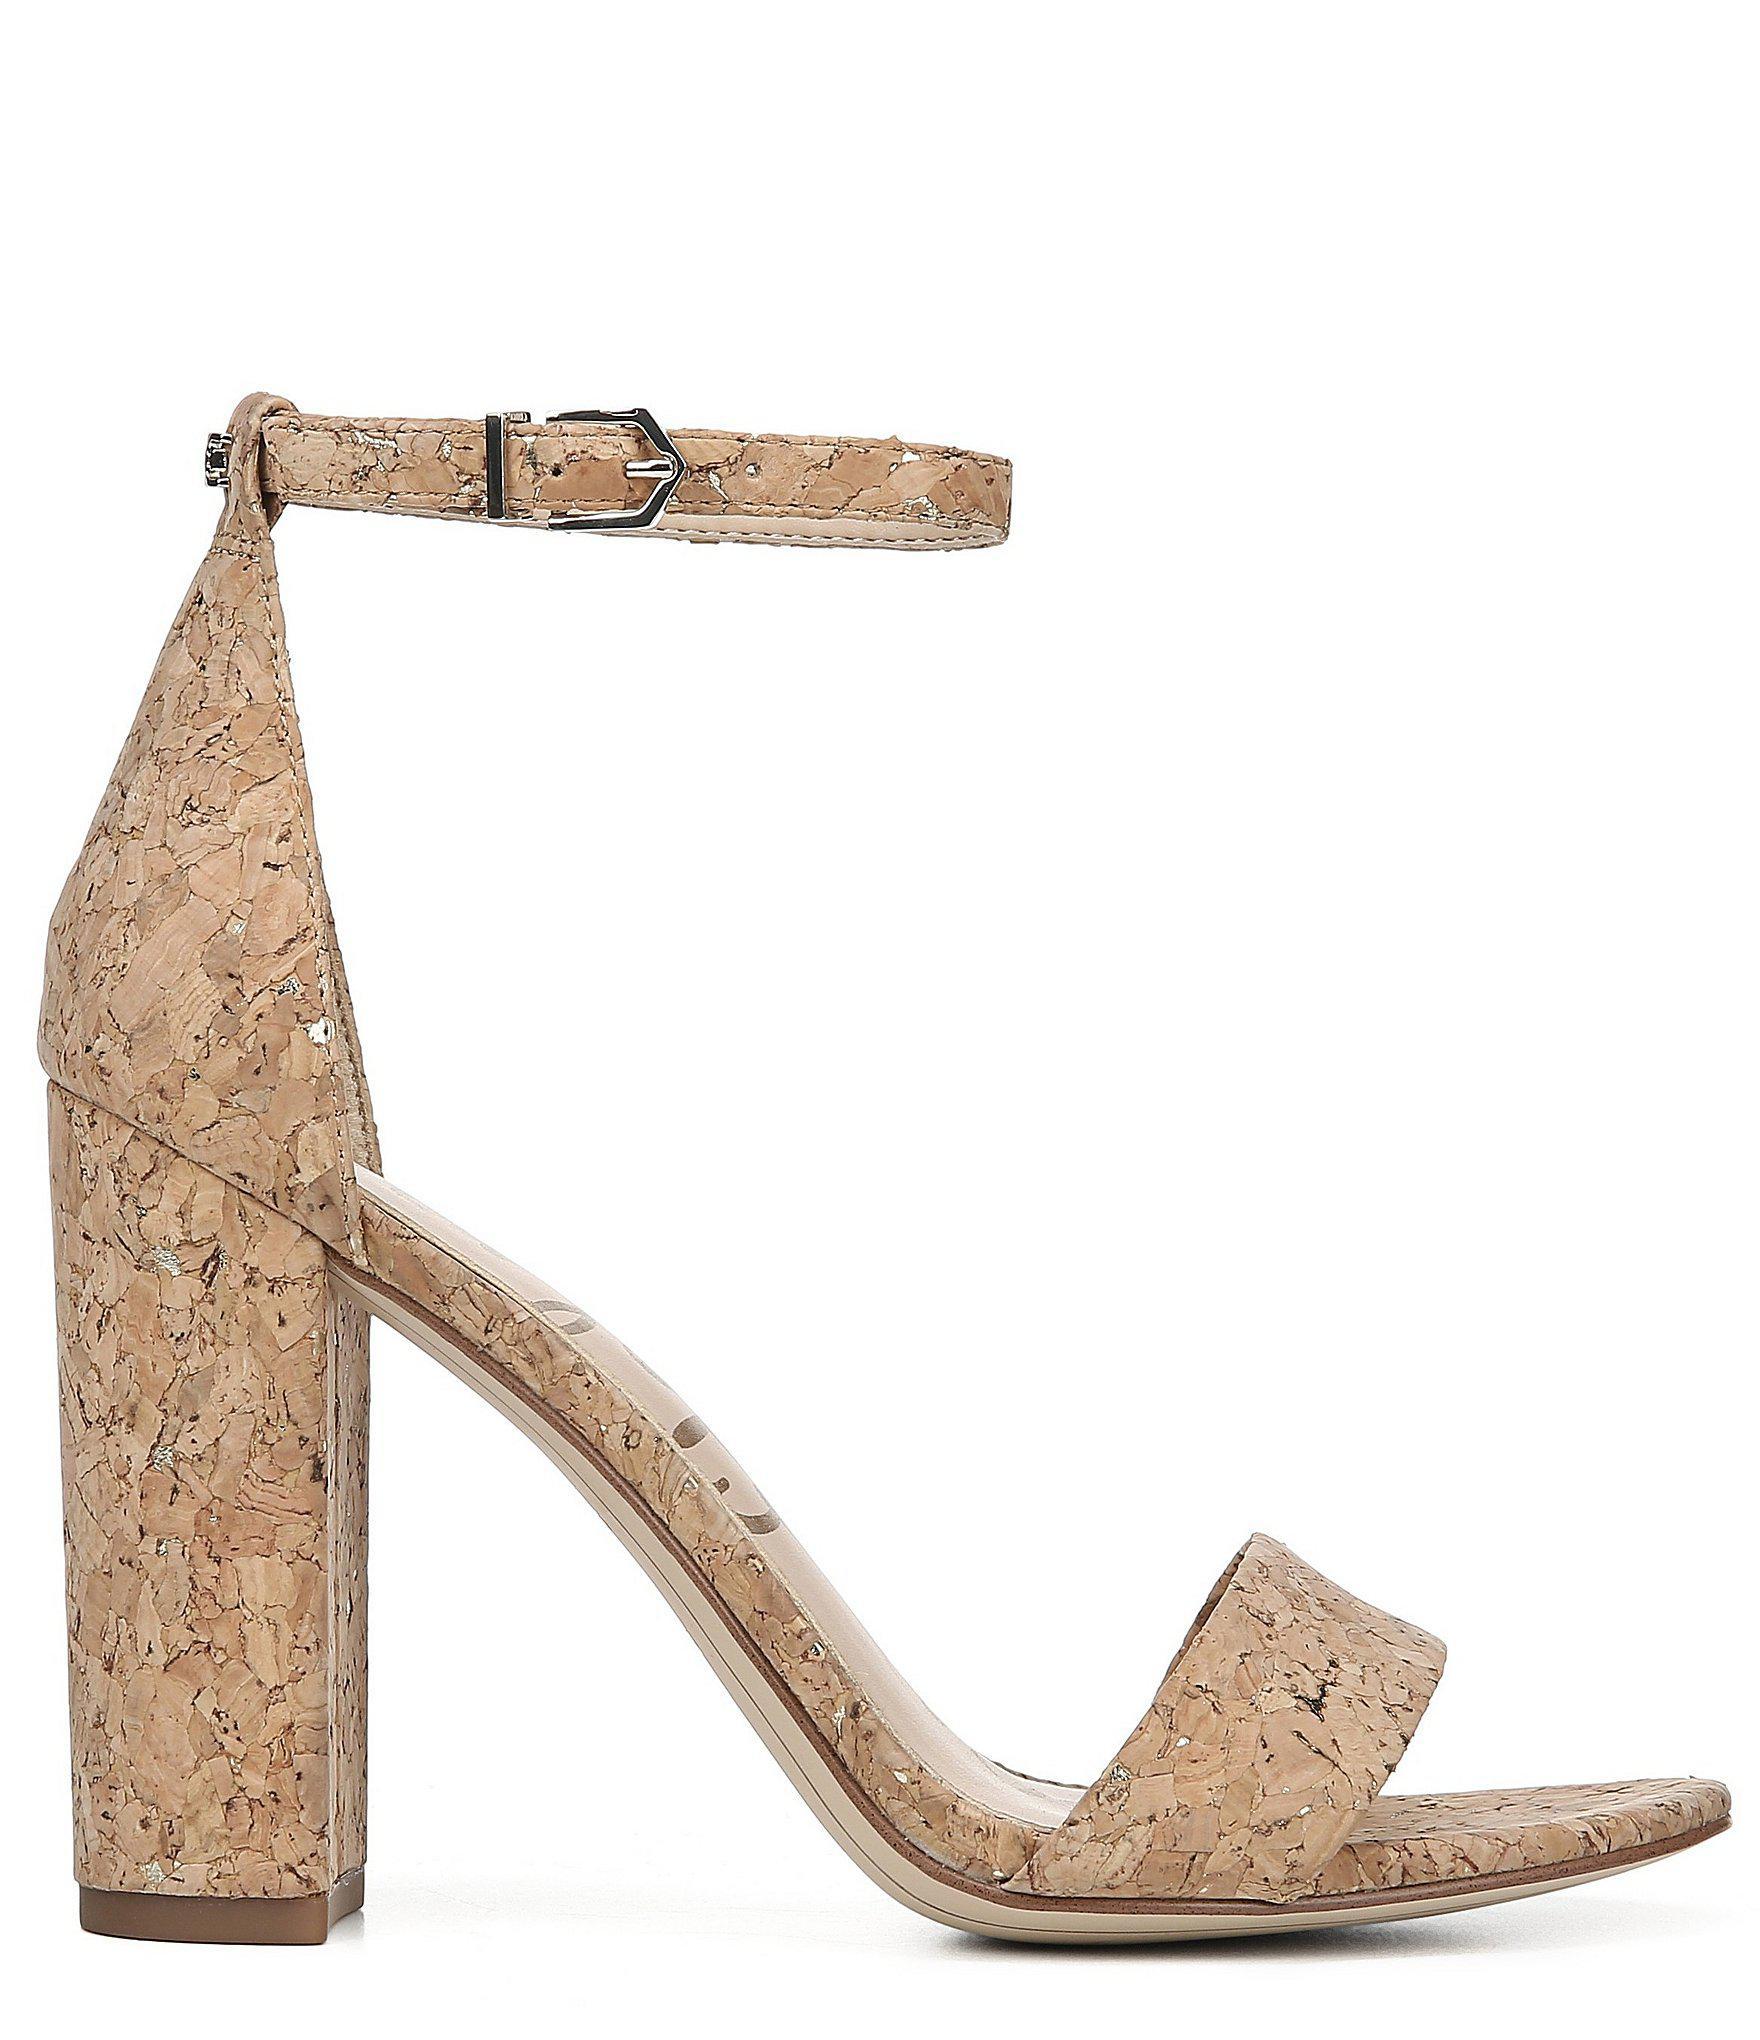 f20777786 Lyst - Sam Edelman Yaro Metallic Cork Block Heel Dress Sandals in ...